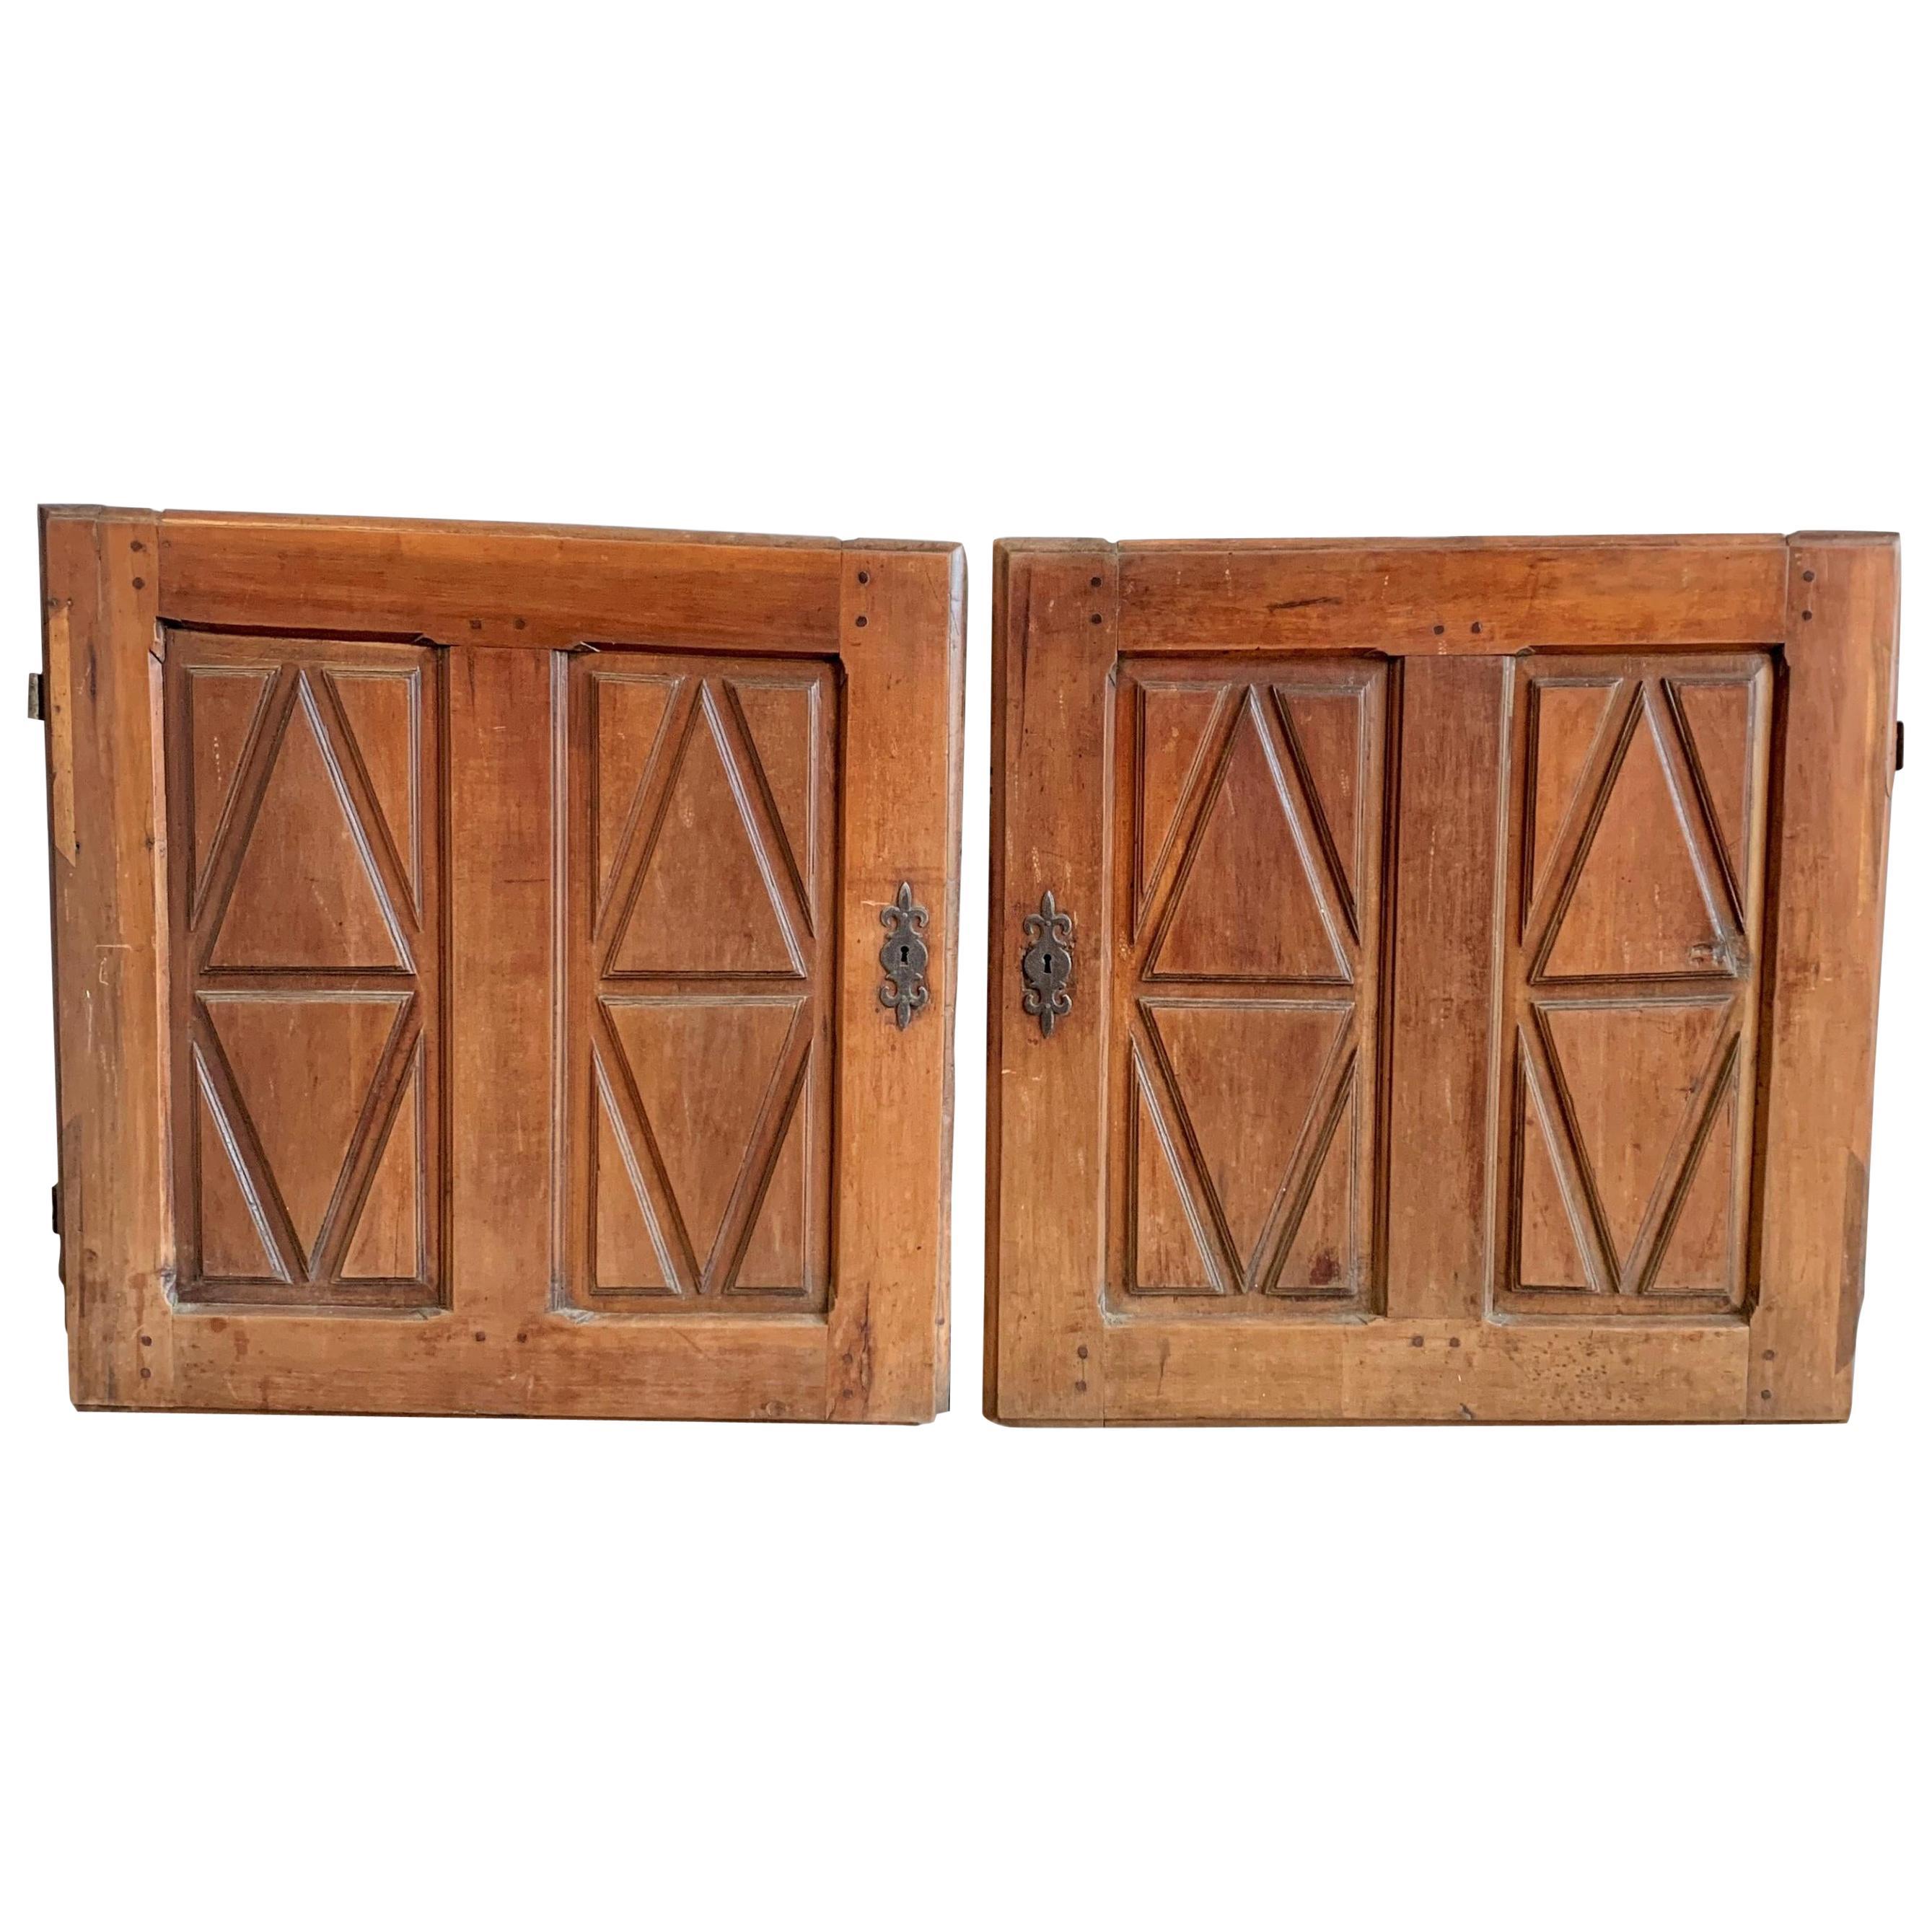 Pair of 18th Century Cabinet Doors, Cherry